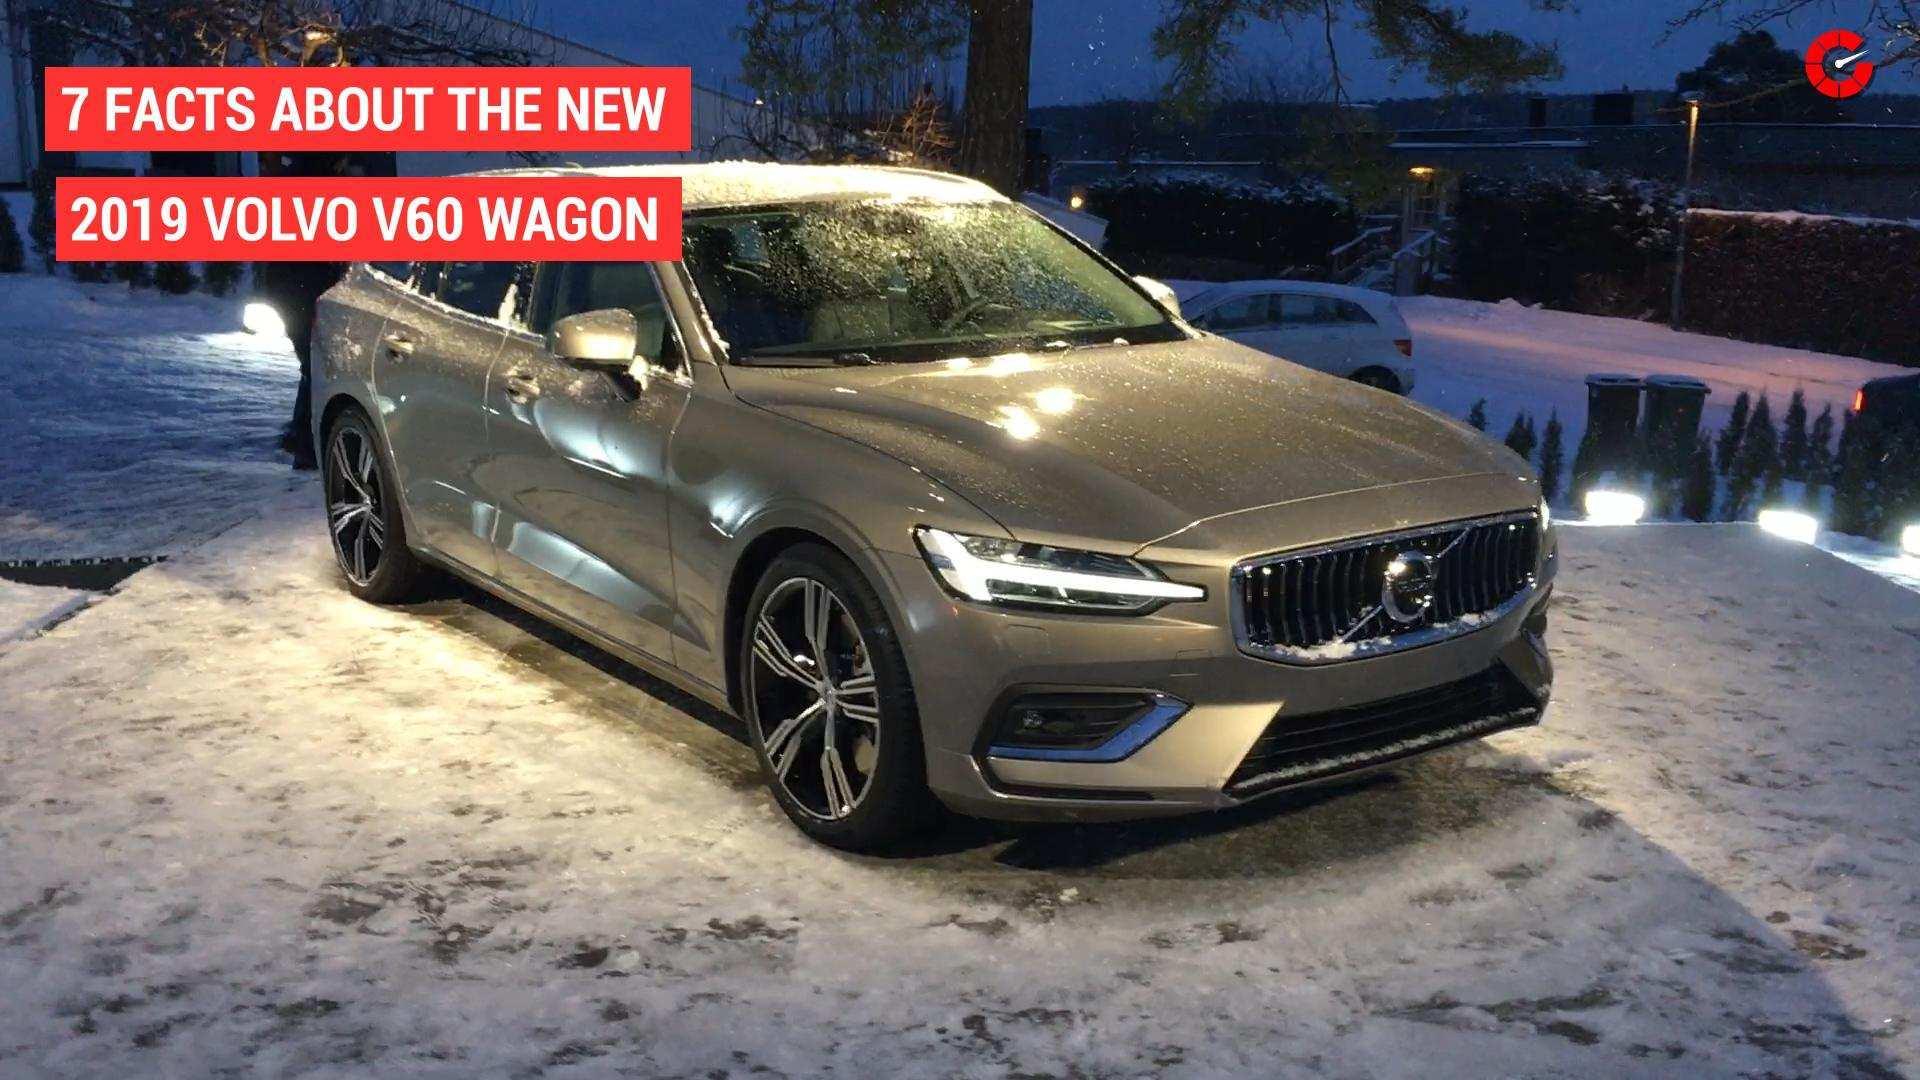 97 New New 2019 Volvo V60 Price with New 2019 Volvo V60